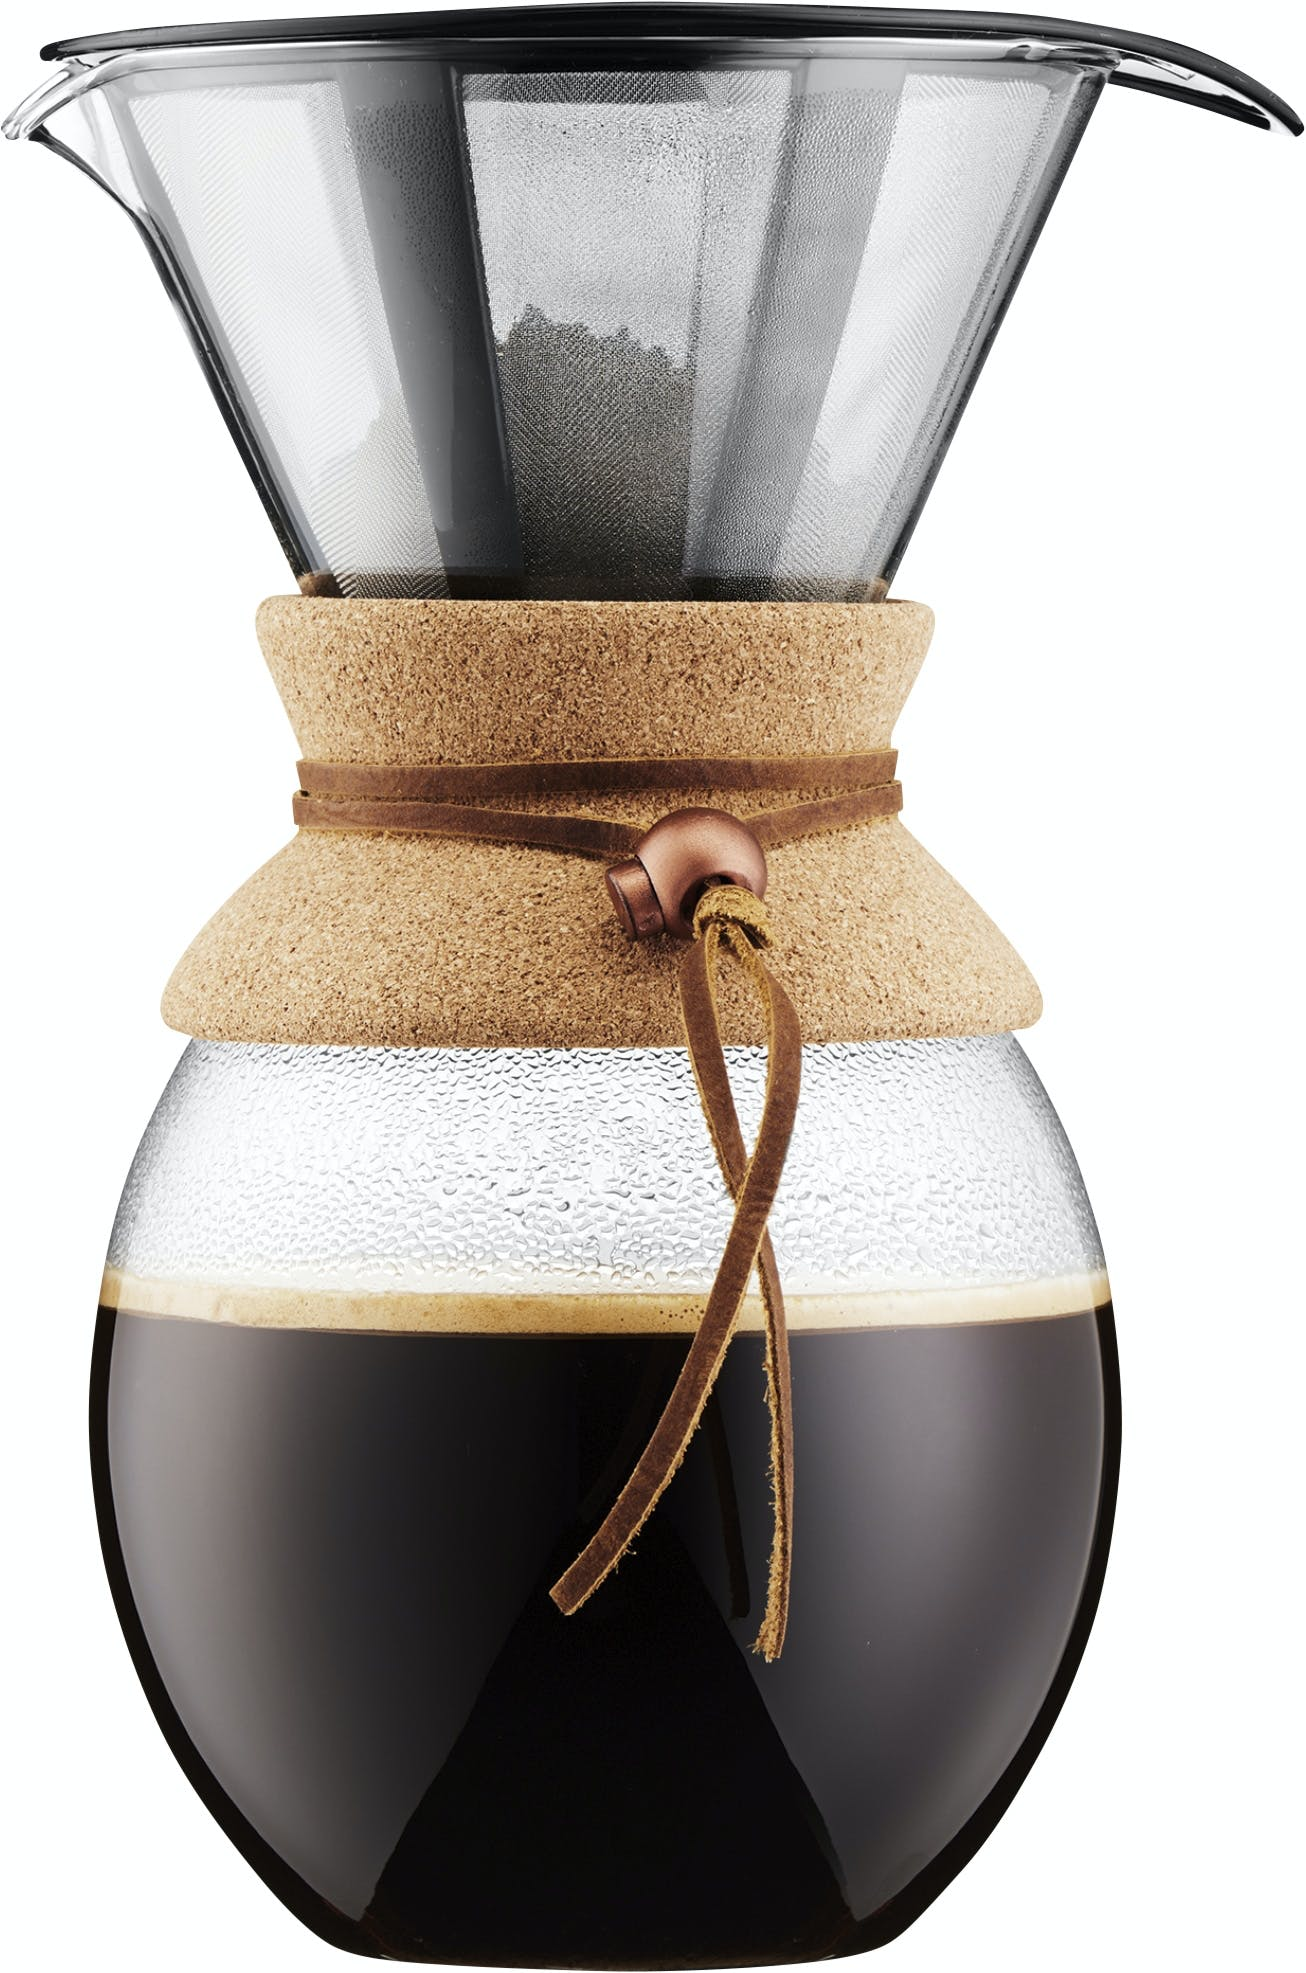 Bodum slow kaffe